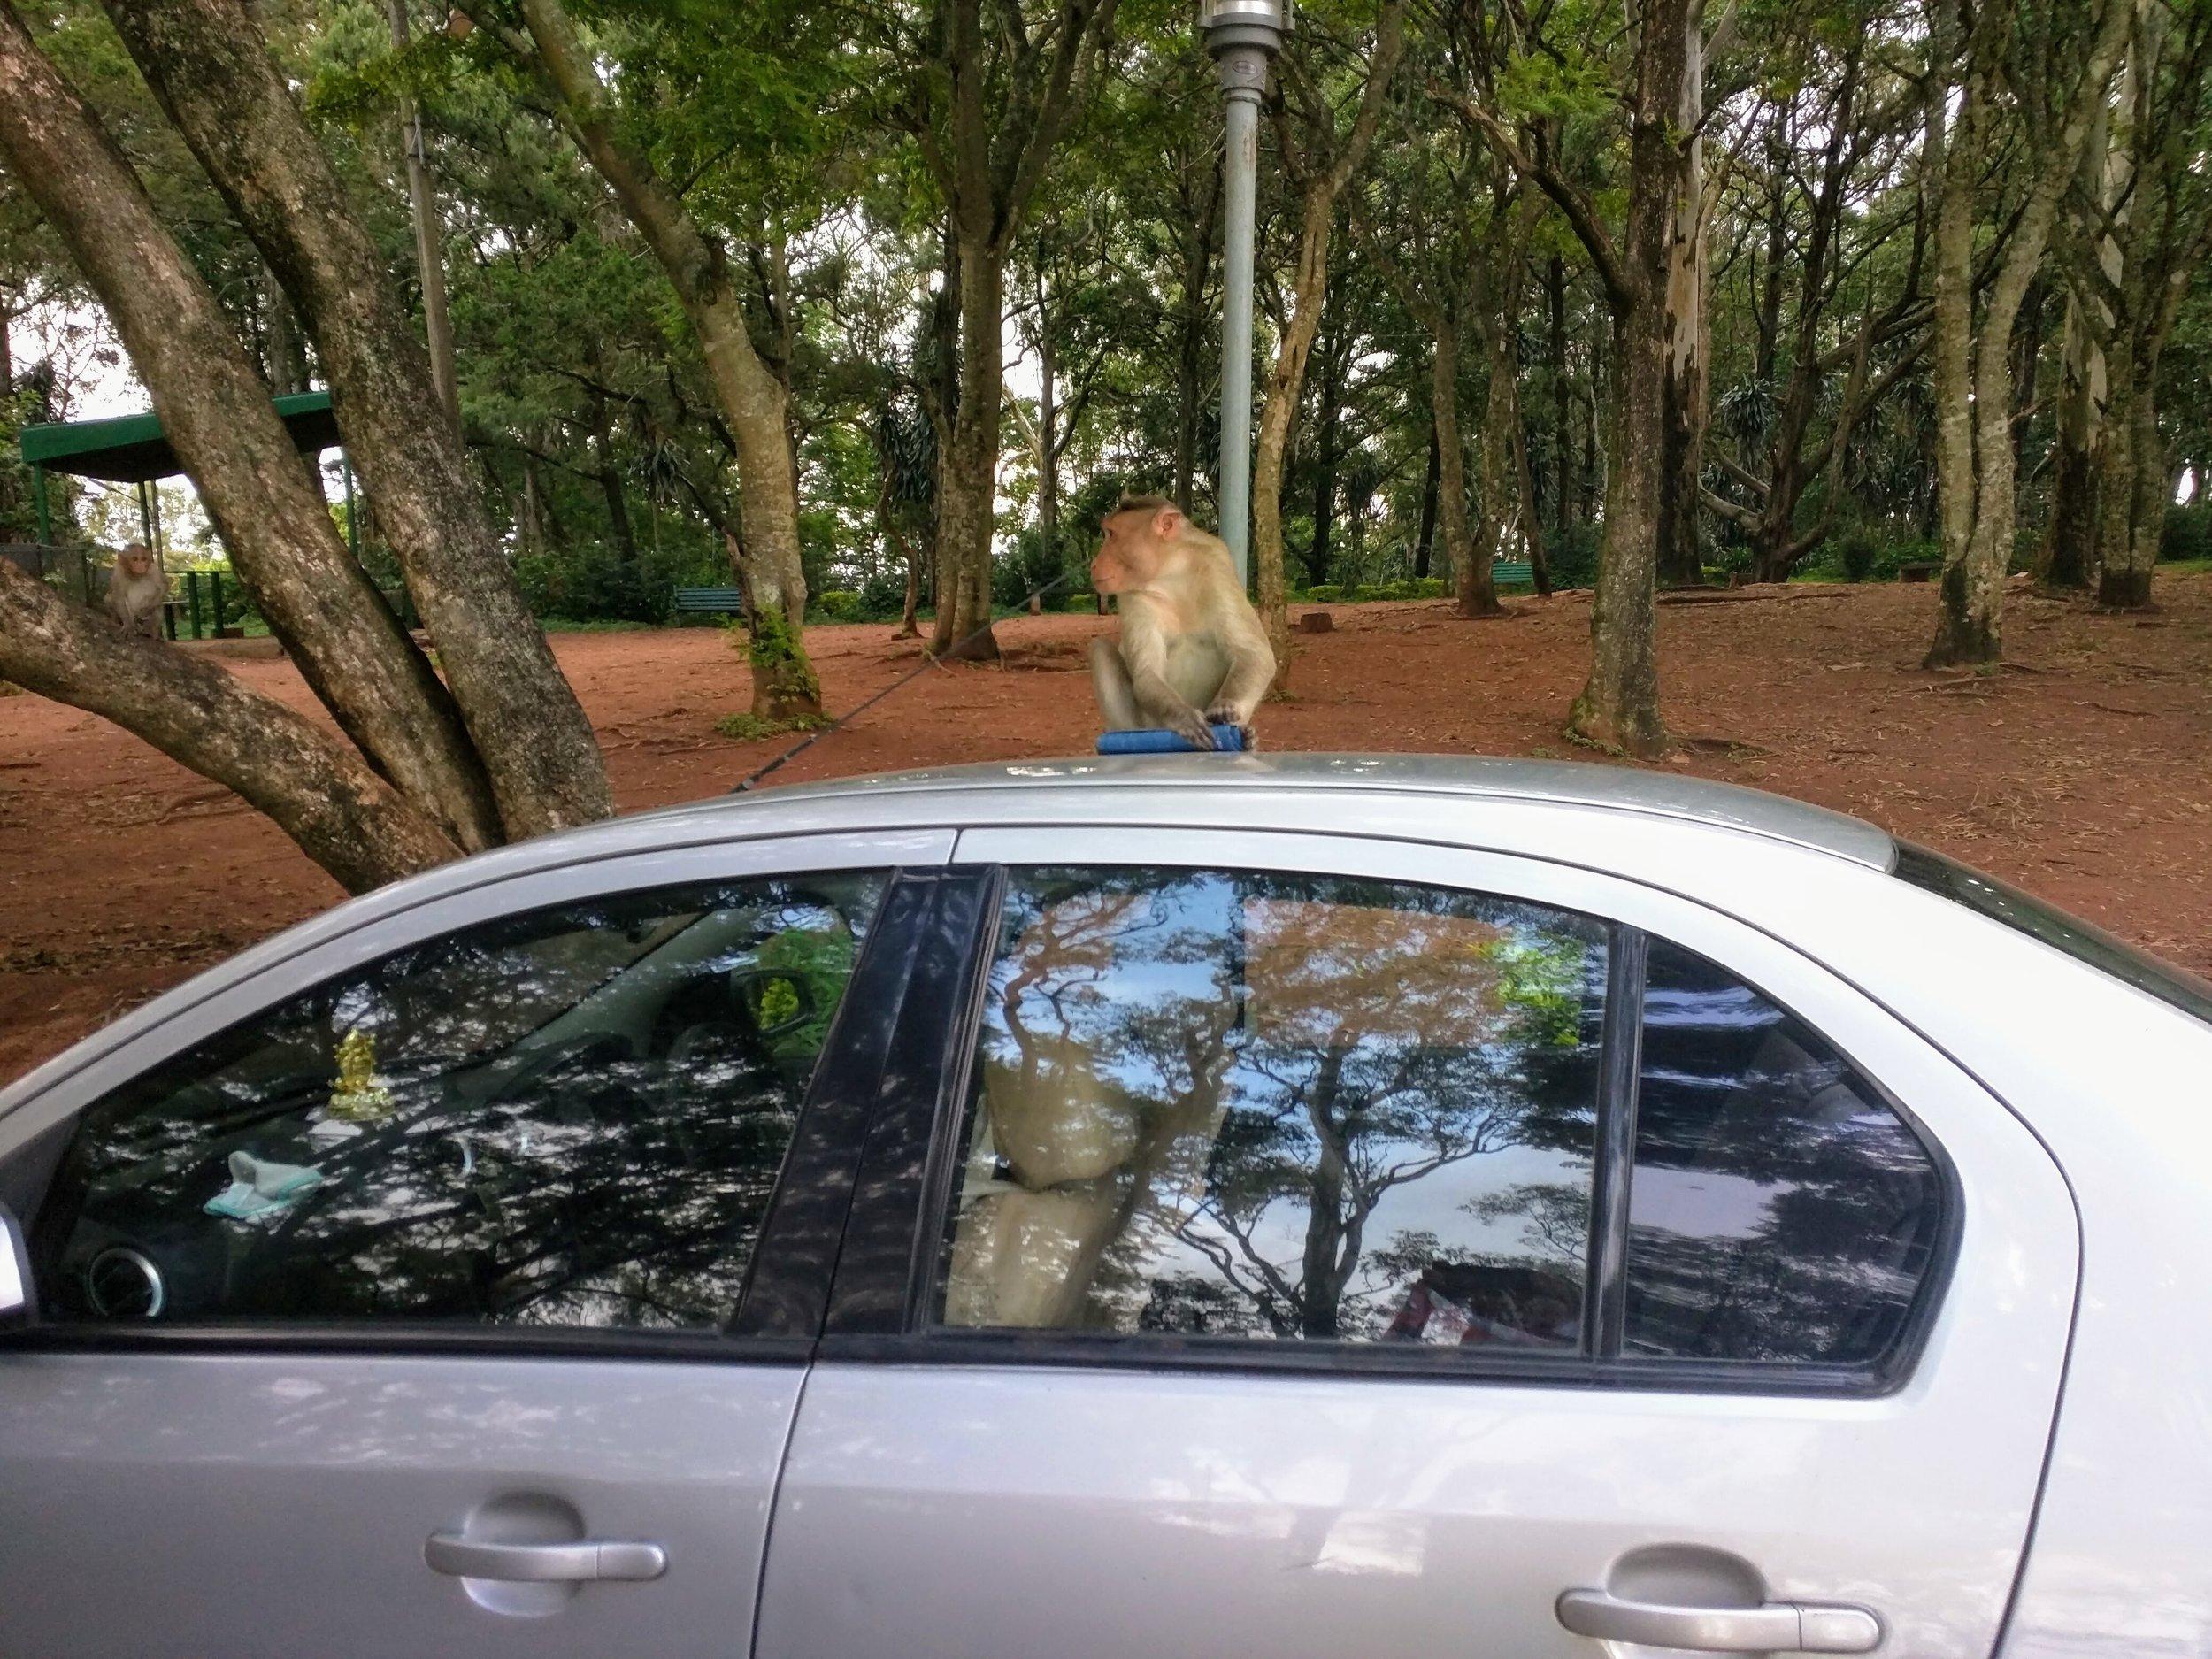 Beware of the Monkey Thief!